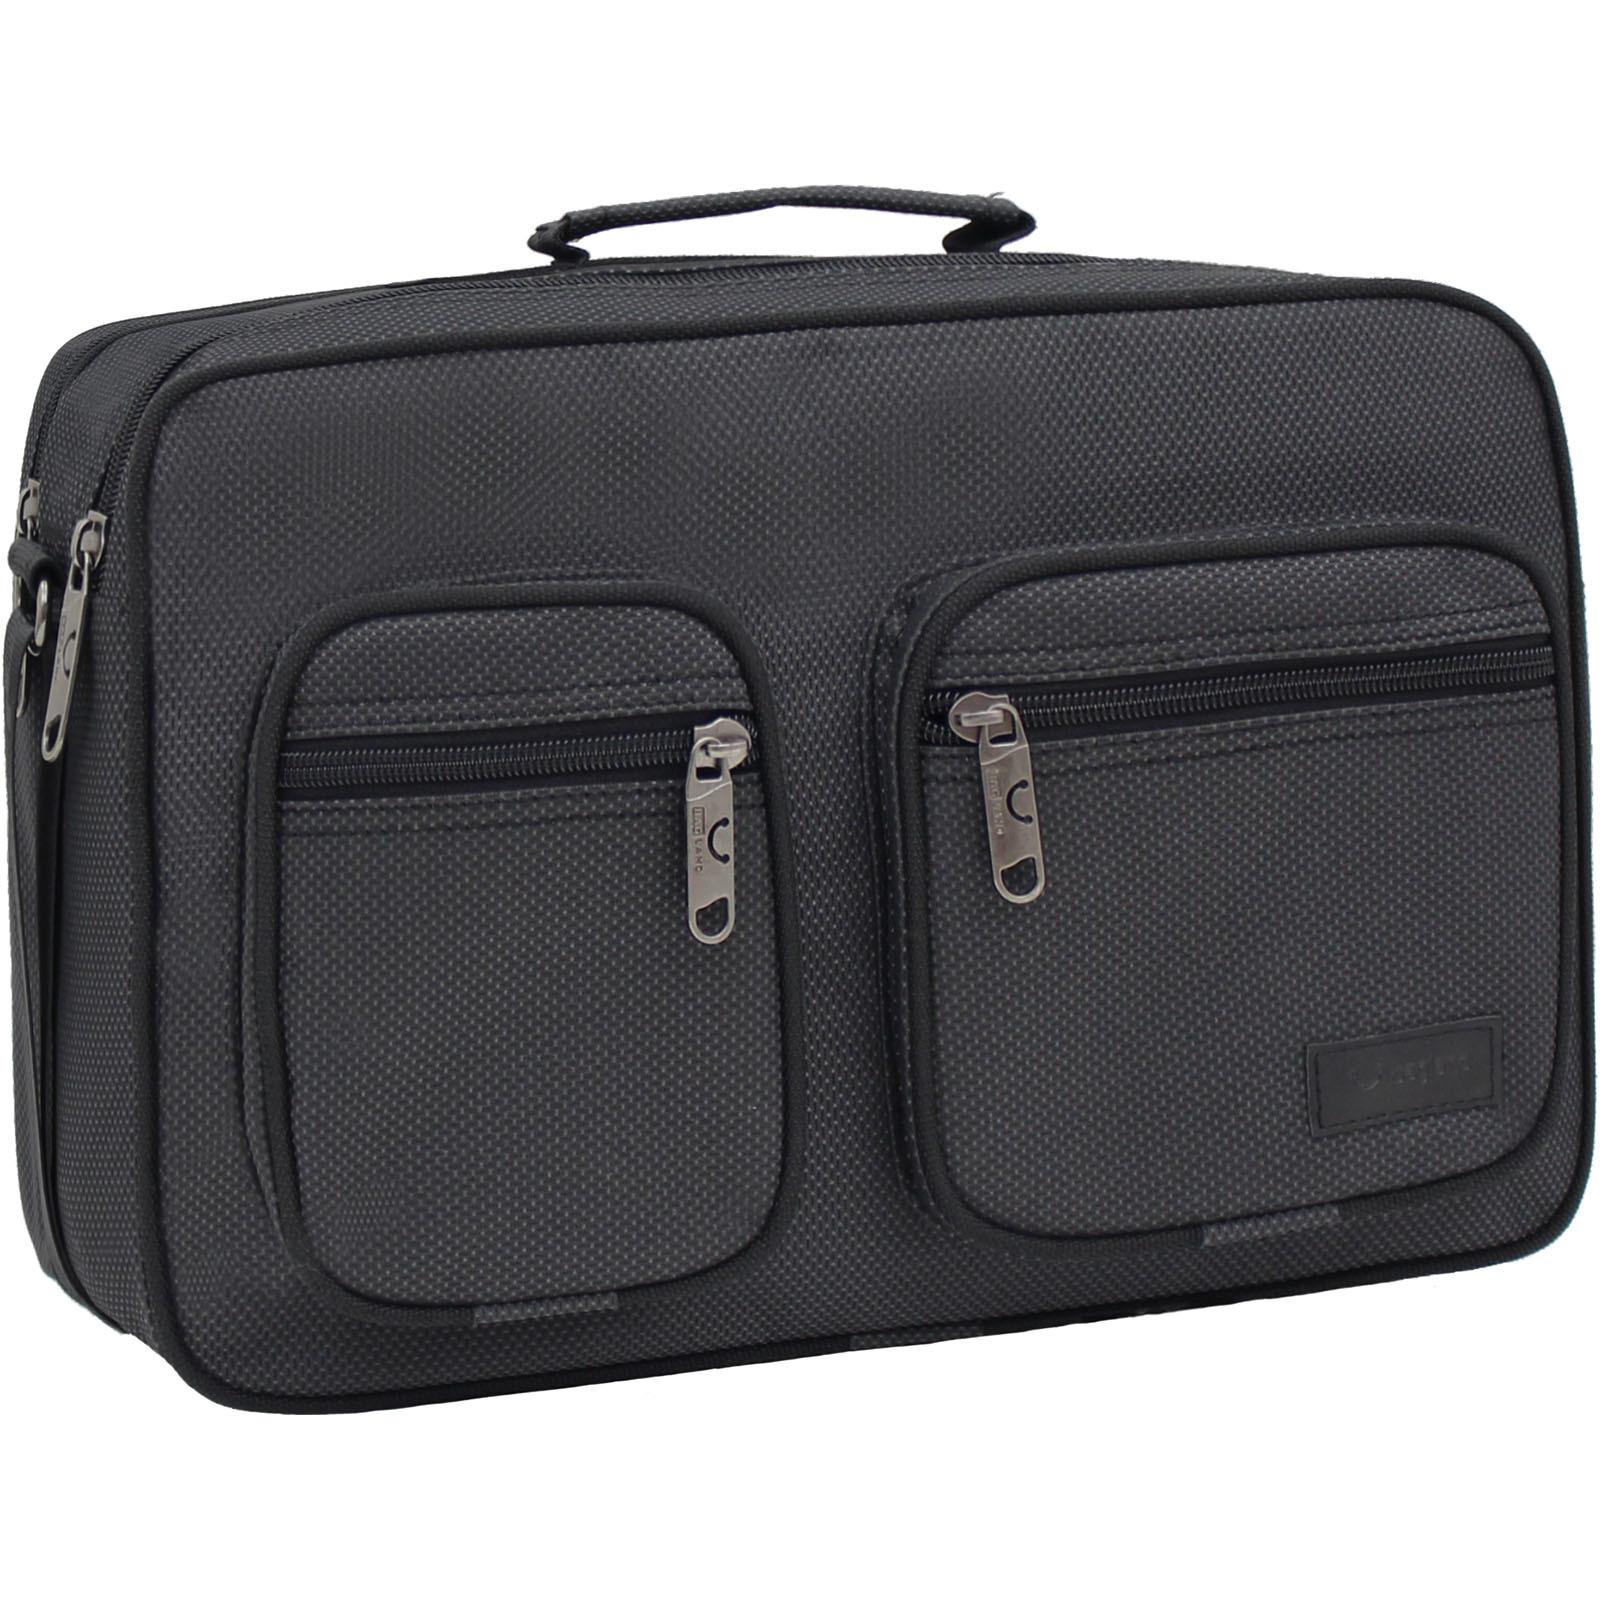 Сумки через плечо Мужская сумка Bagland Mr.Black 11 л. Чёрный (00264169) IMG_1575.JPG